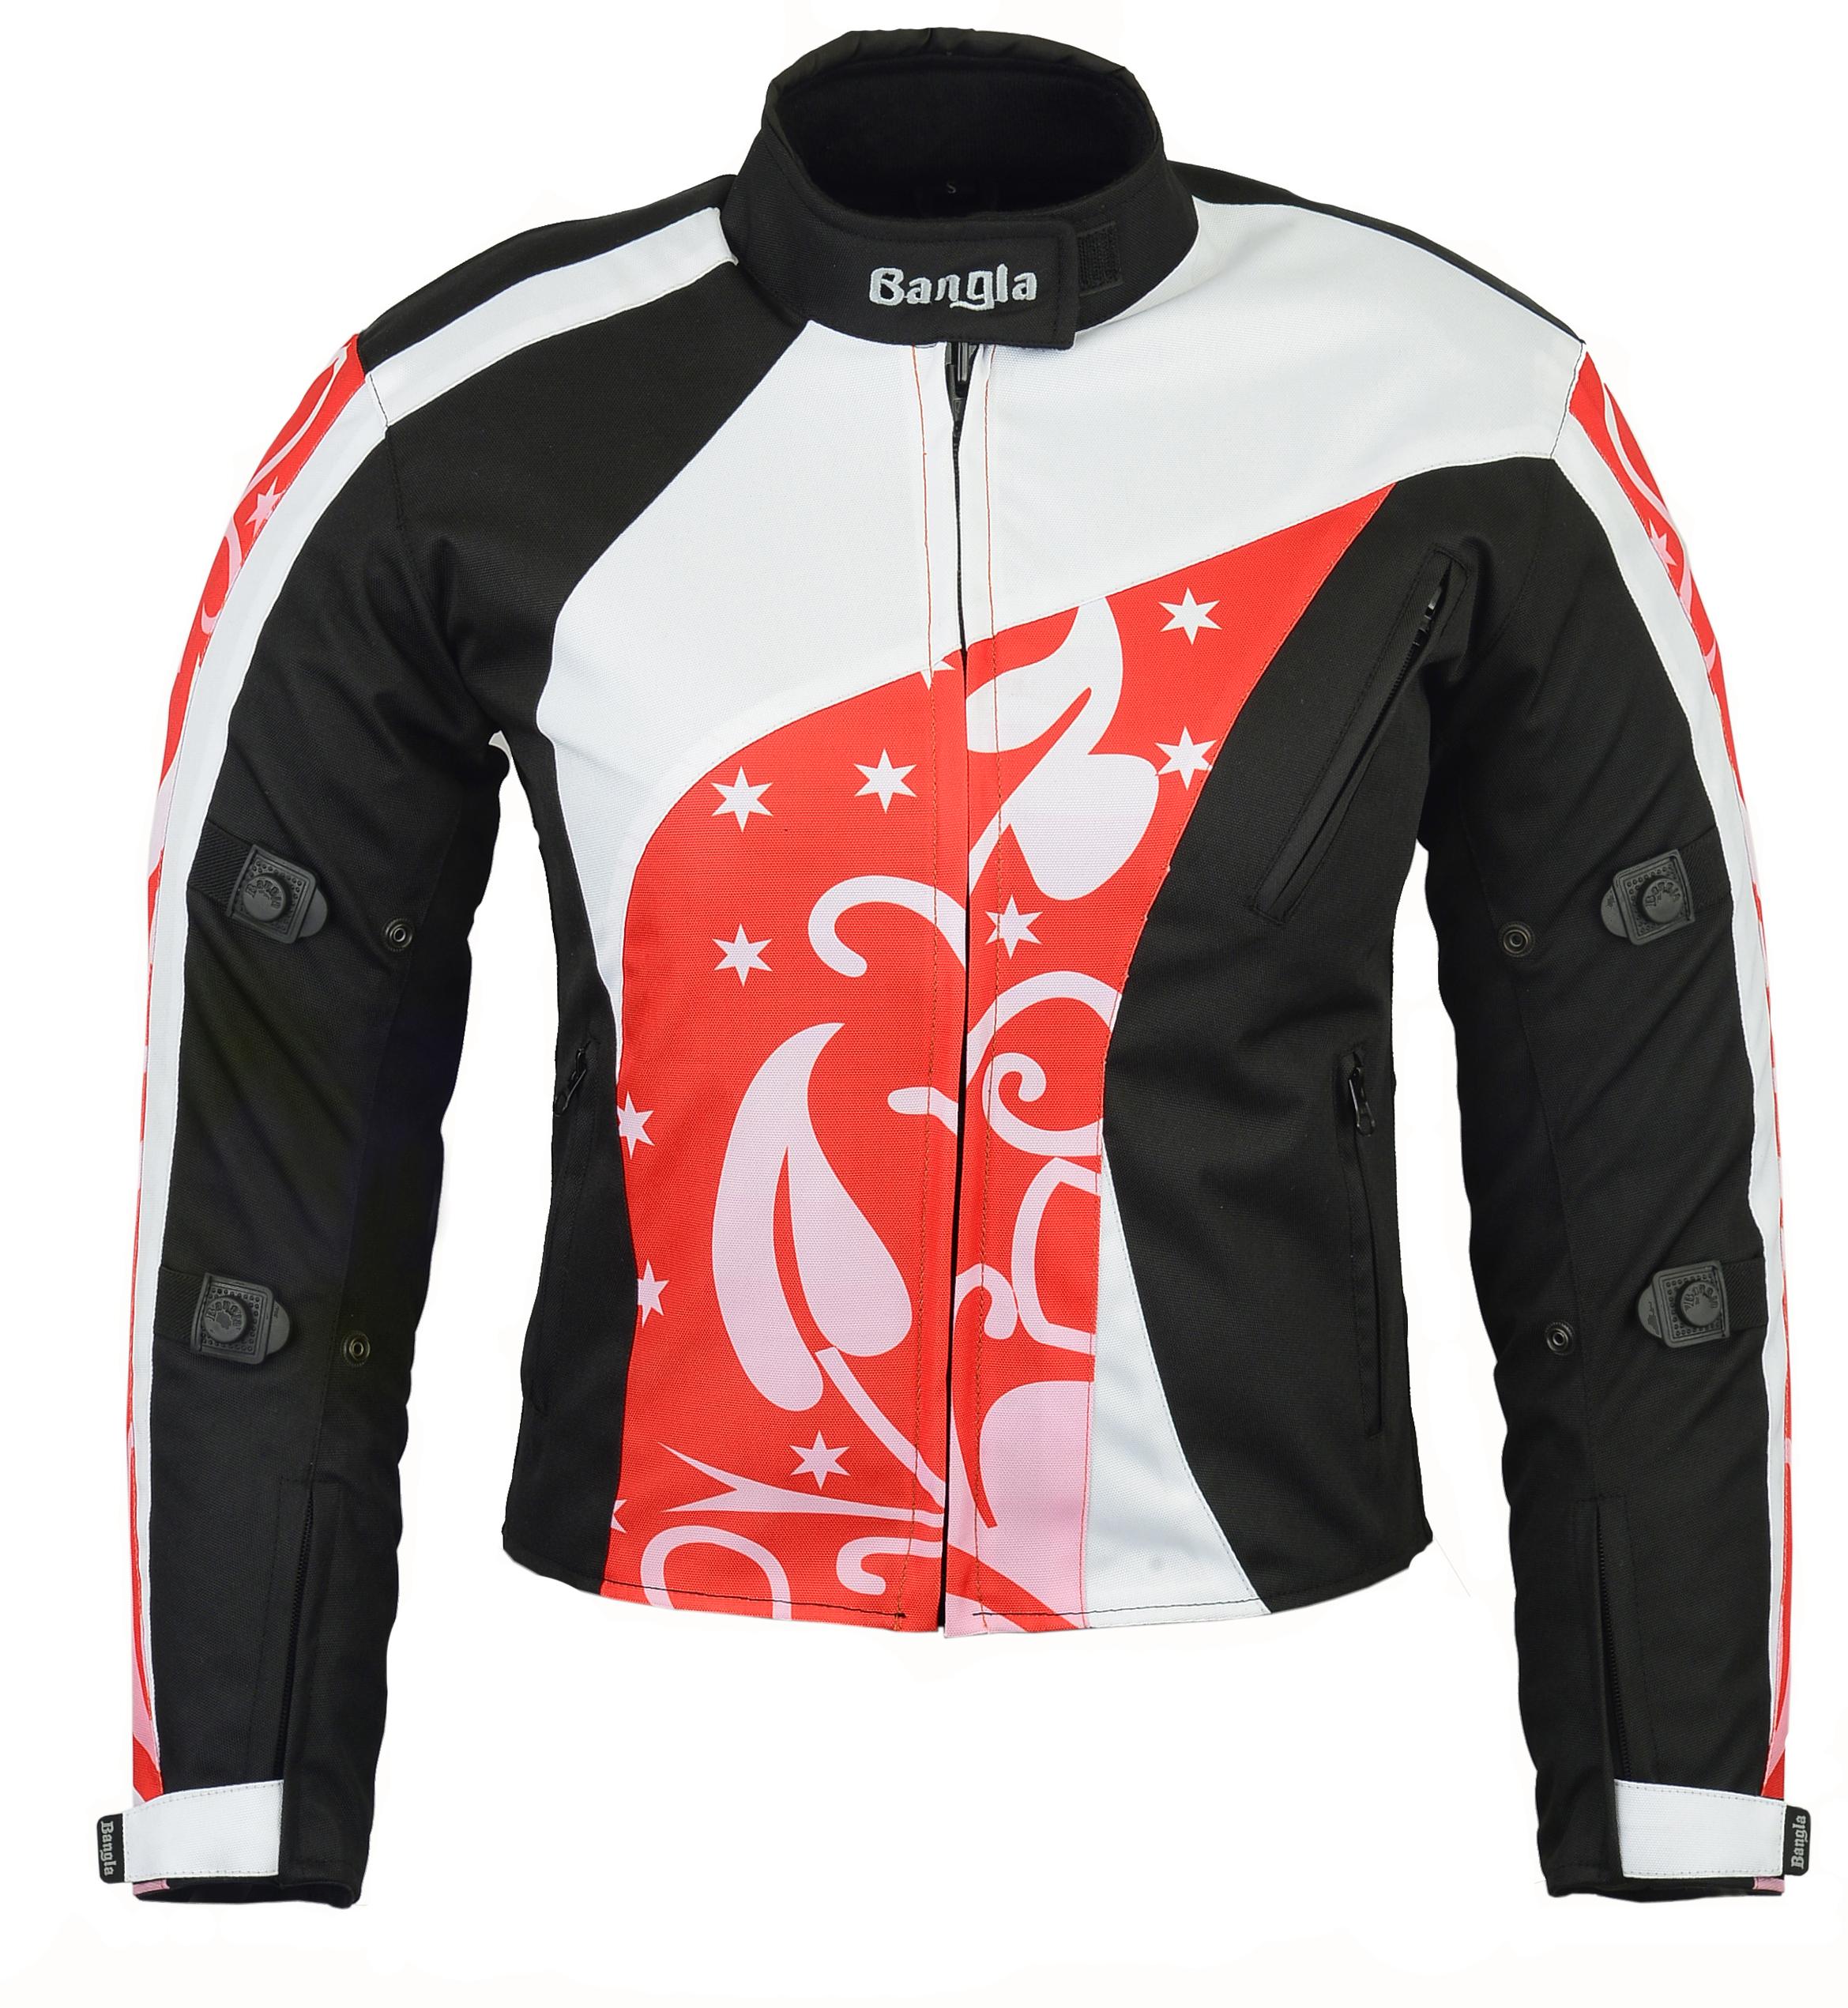 Bangla Damen Motorrad Jacke Motorracke Textil Schwarz/rot/weissS M L XL XXL XXXL